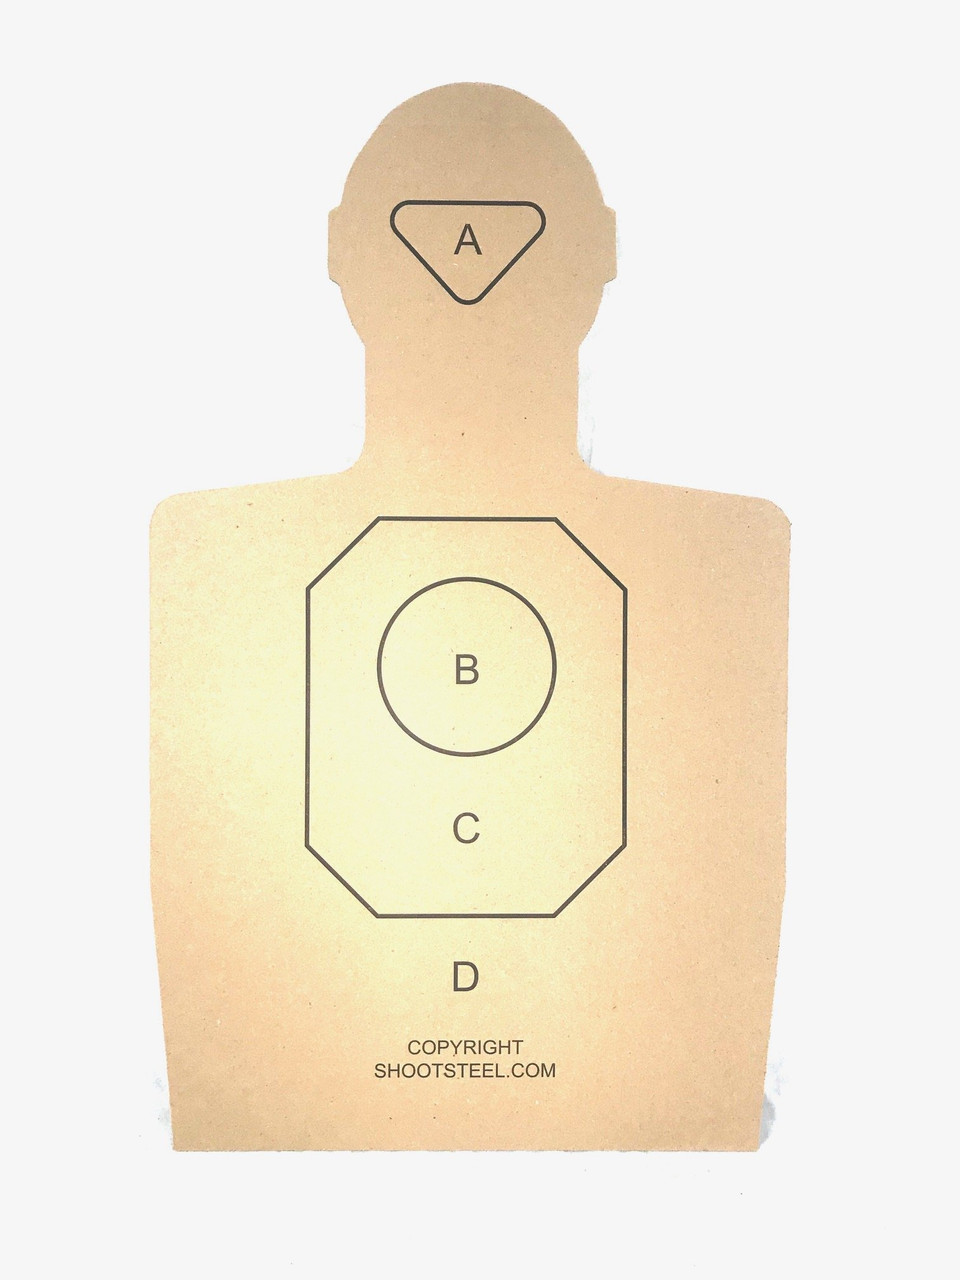 ShootSteel.com Training Targets - Pack of 100